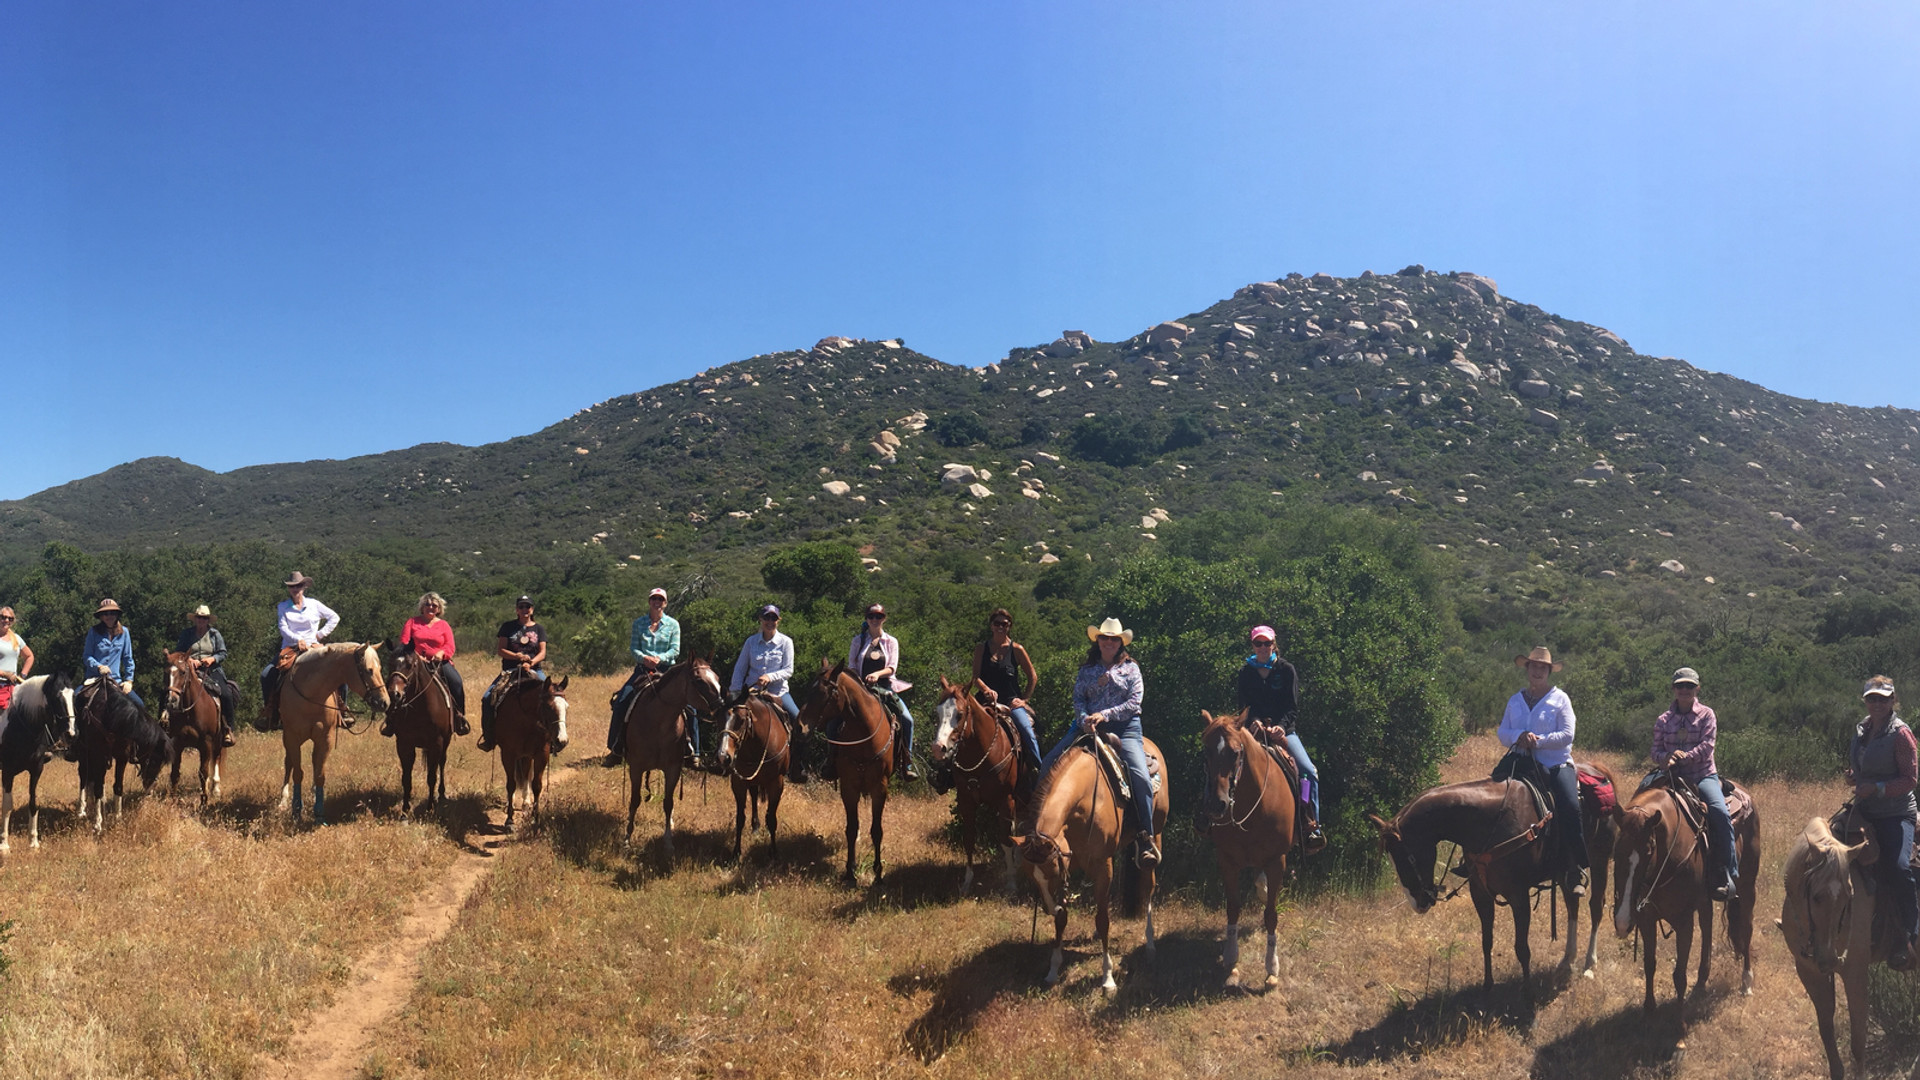 Spring Ride - Tenaja-Campo Caballo - 11 of 18.jpg